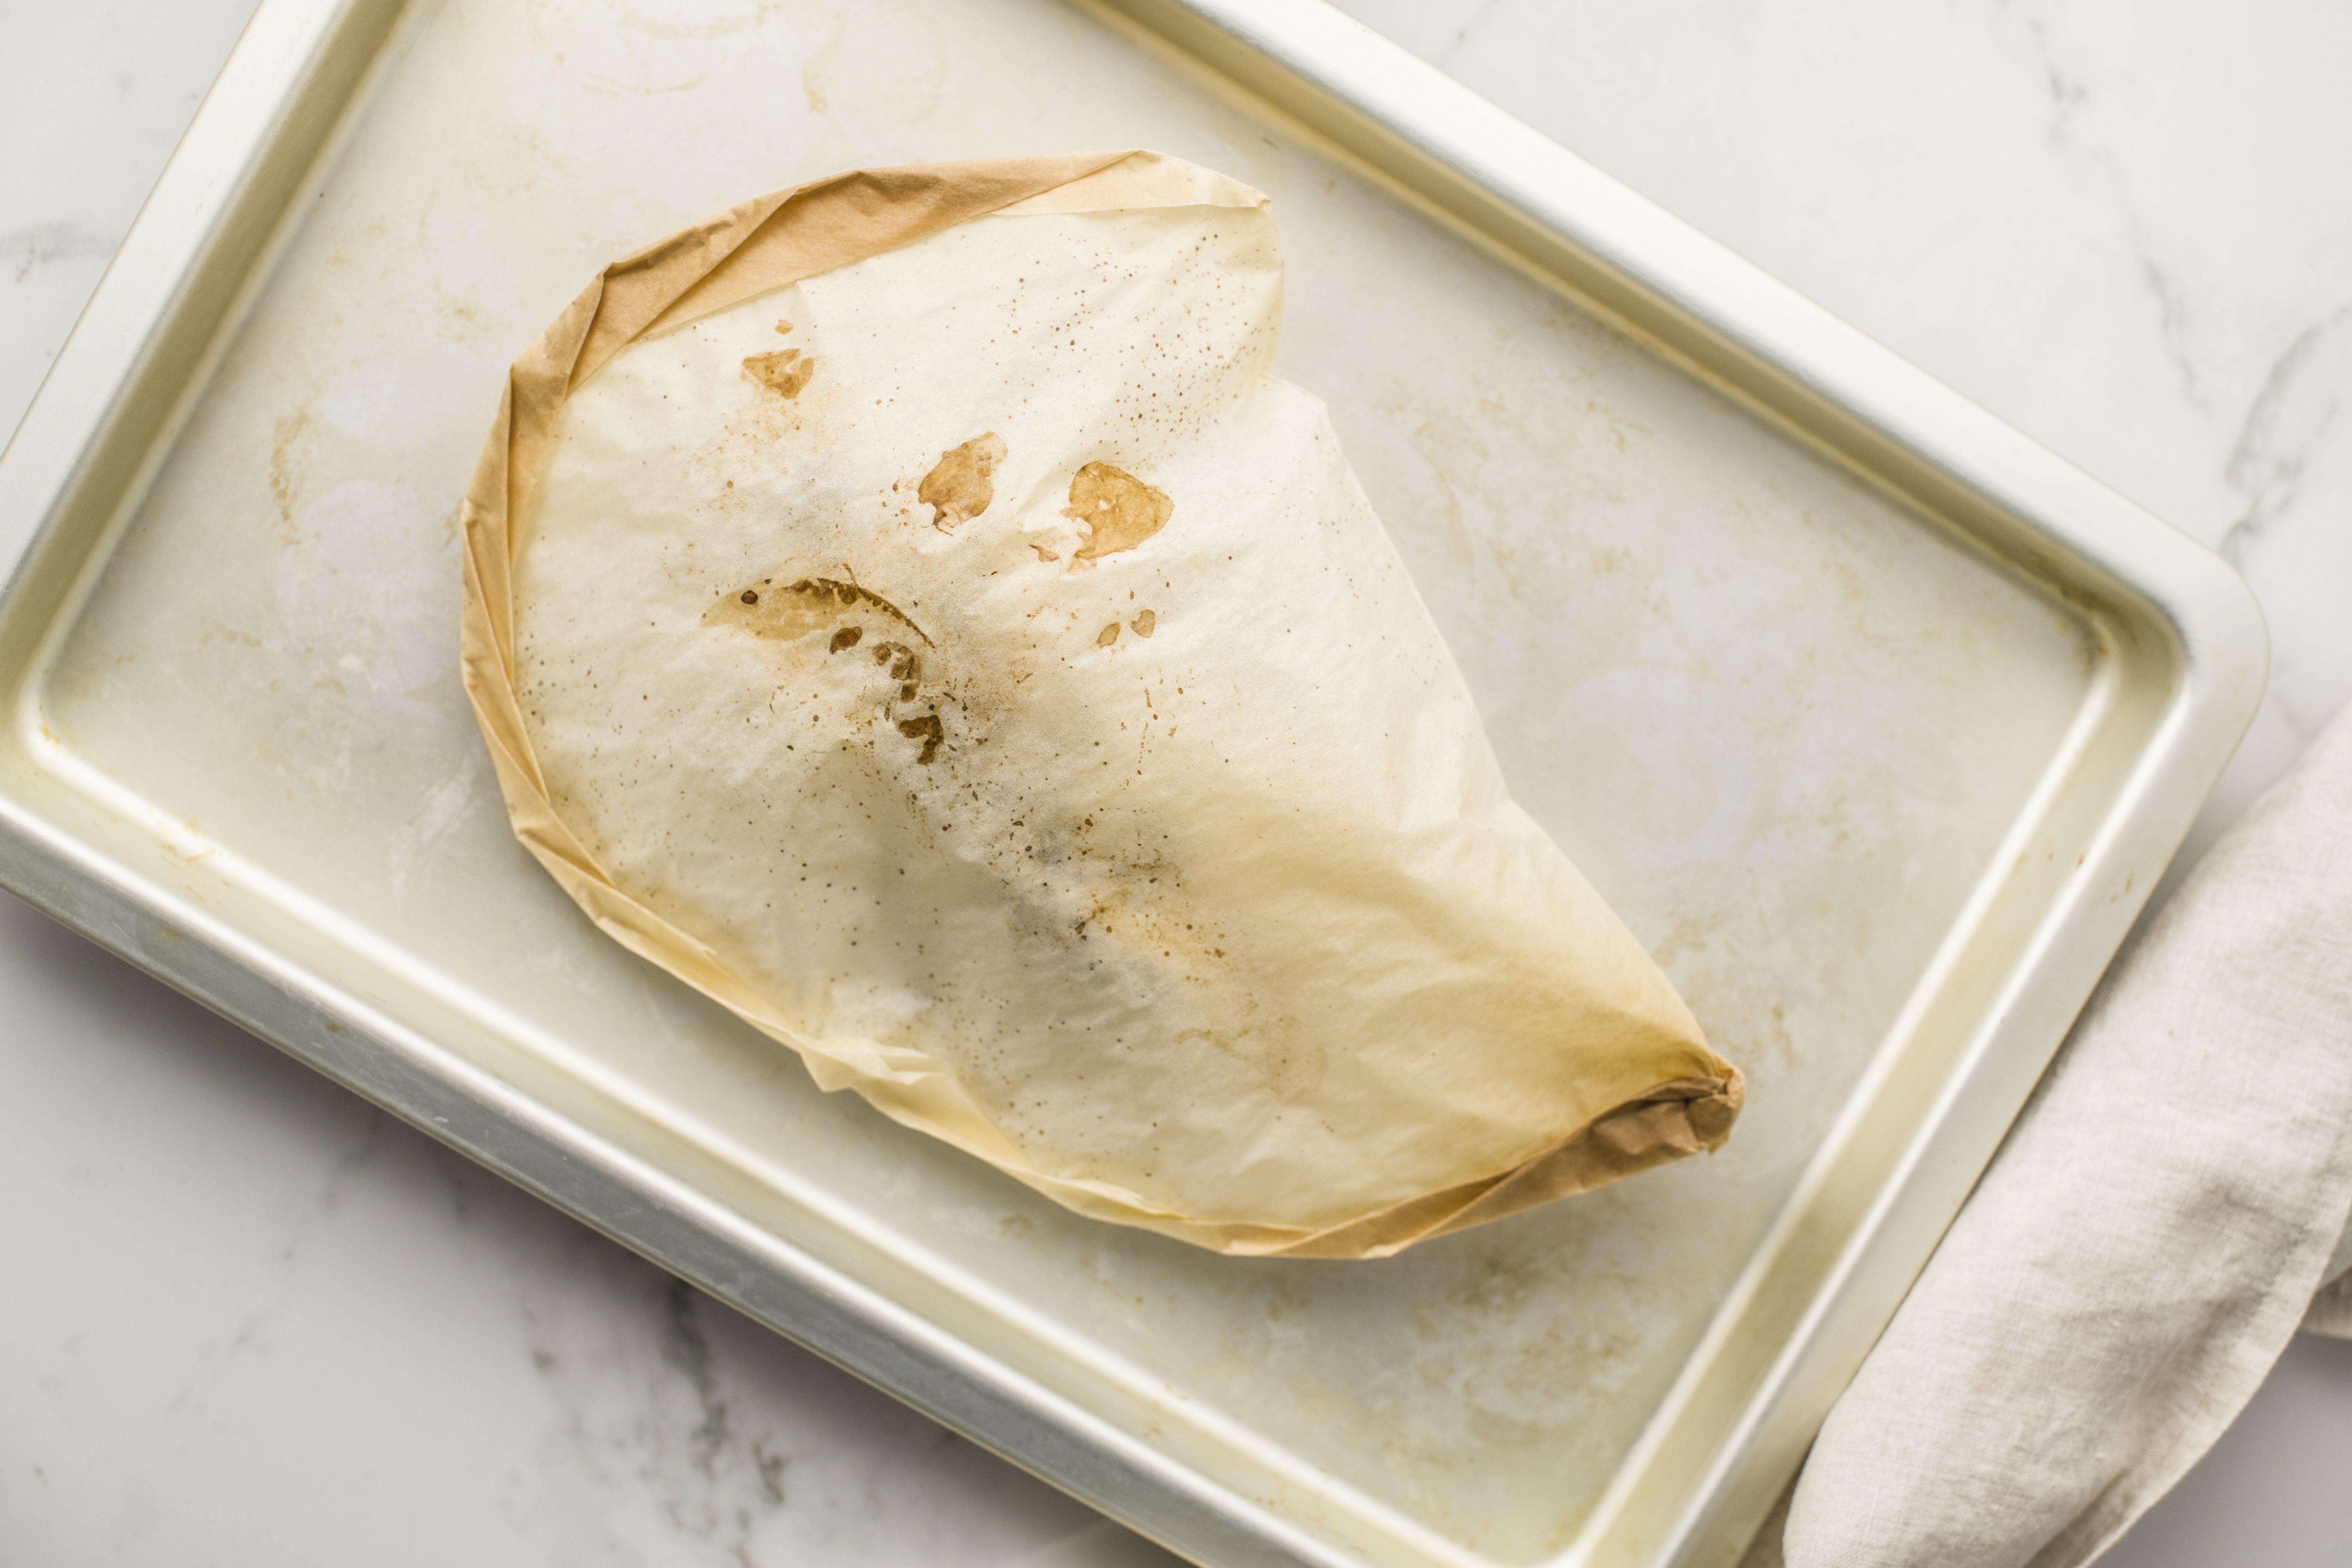 Bake chicken in parchment paper